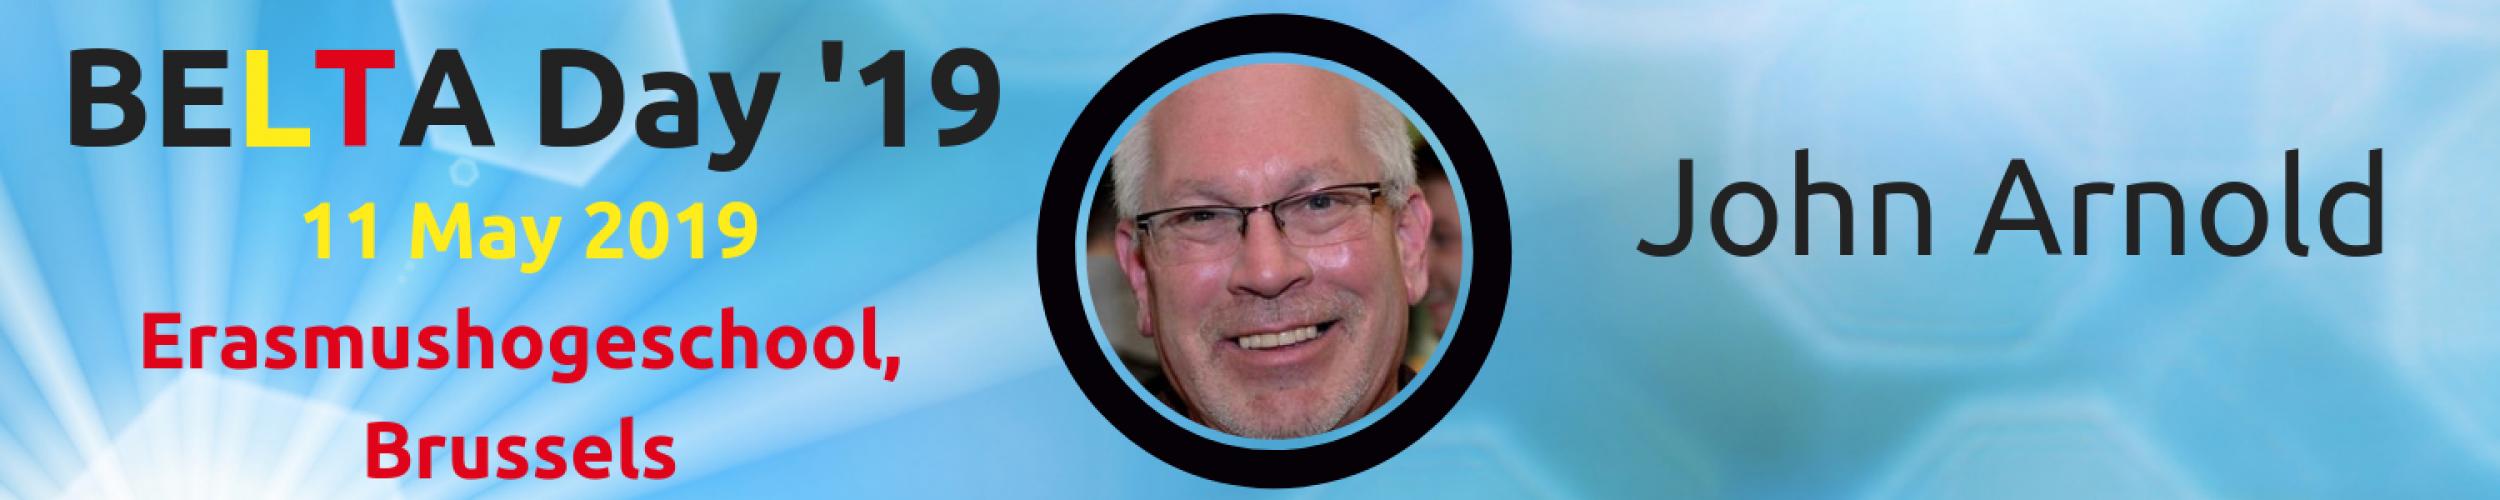 BELTA Day '19: Meet the Speakers: John Arnold